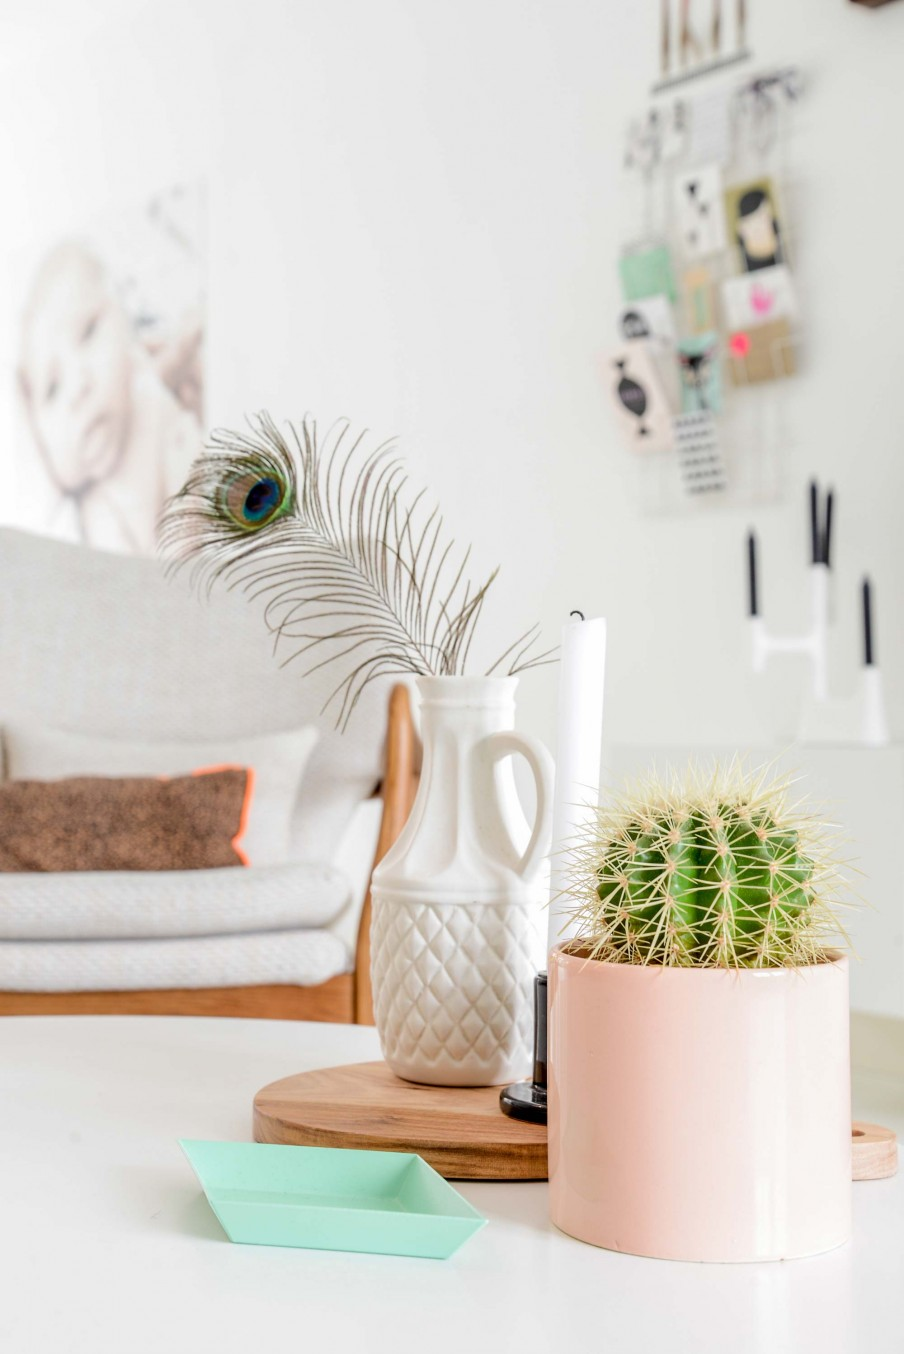 home-tour-vintage-cactus-soliflore-pastel-mademoiselle-claudine